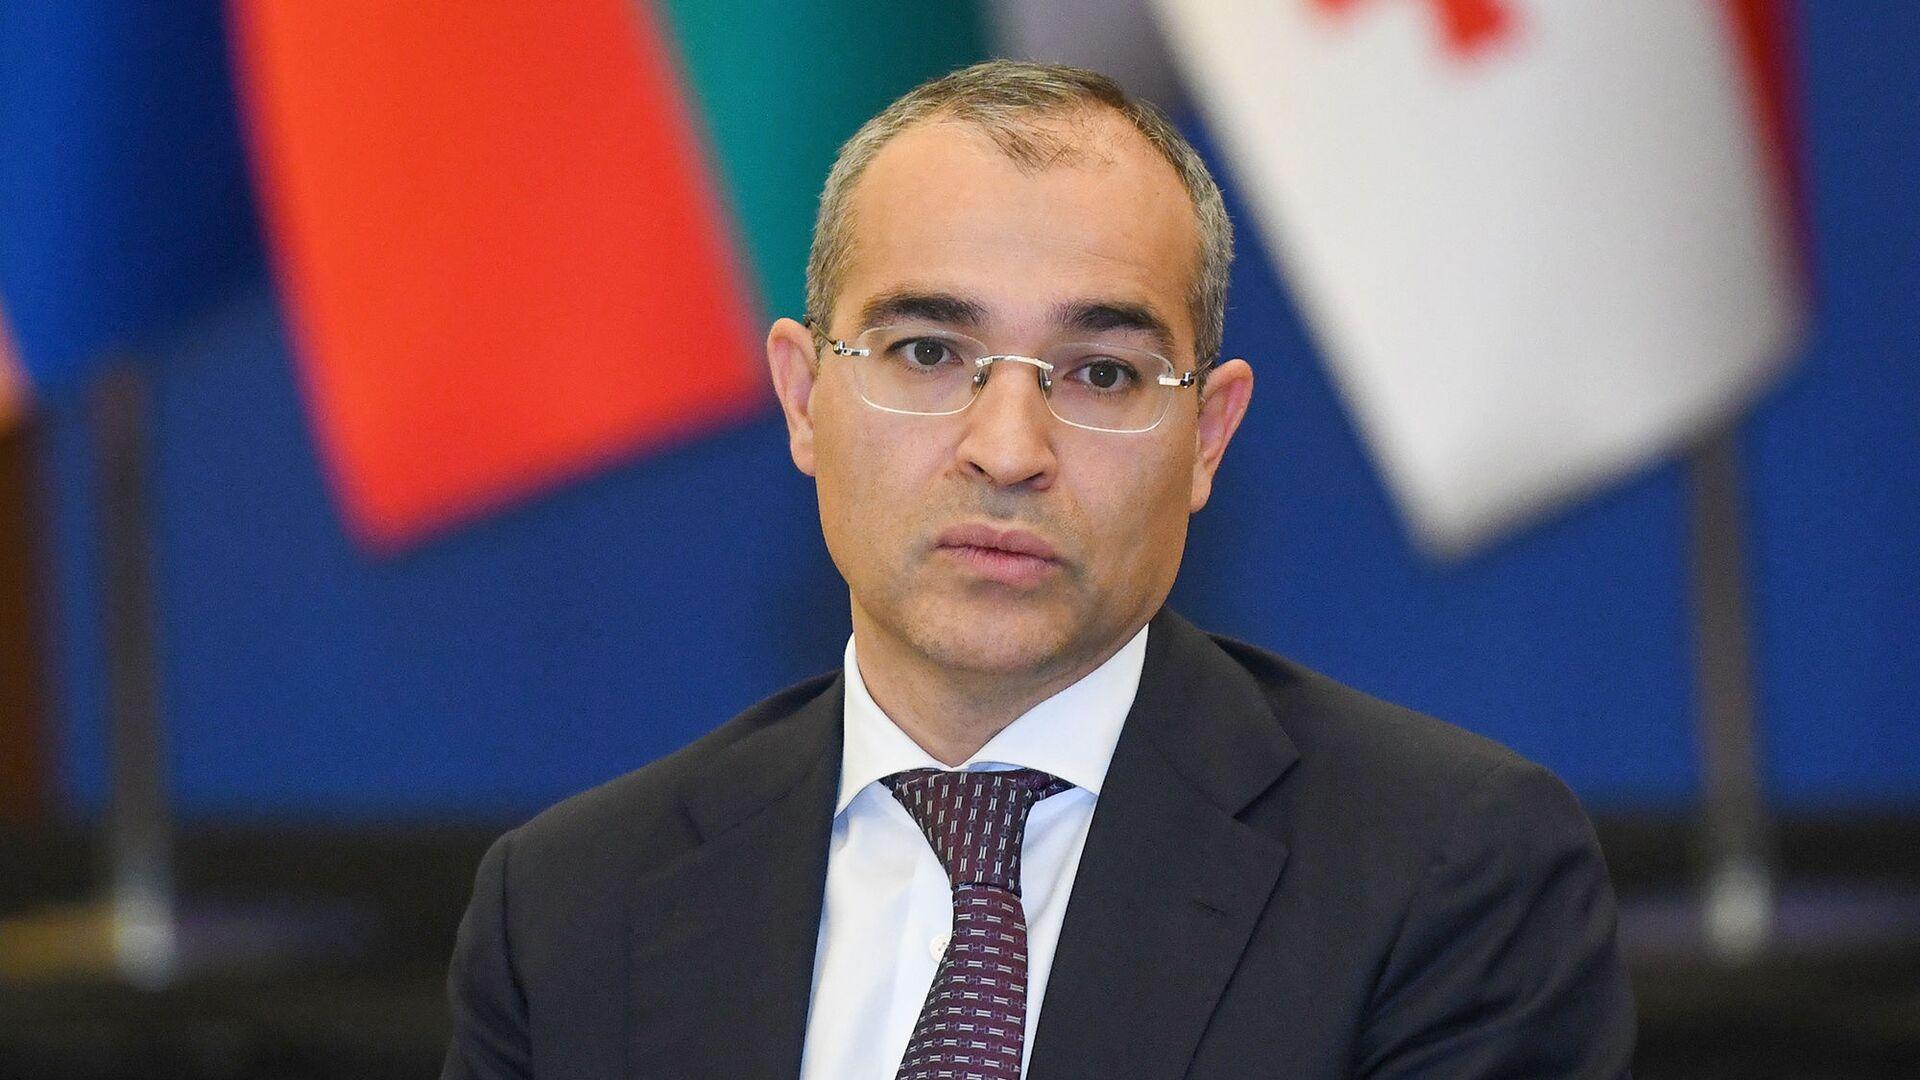 Министр экономики Азербайджана Микаил Джаббаров - Sputnik Azərbaycan, 1920, 23.09.2021